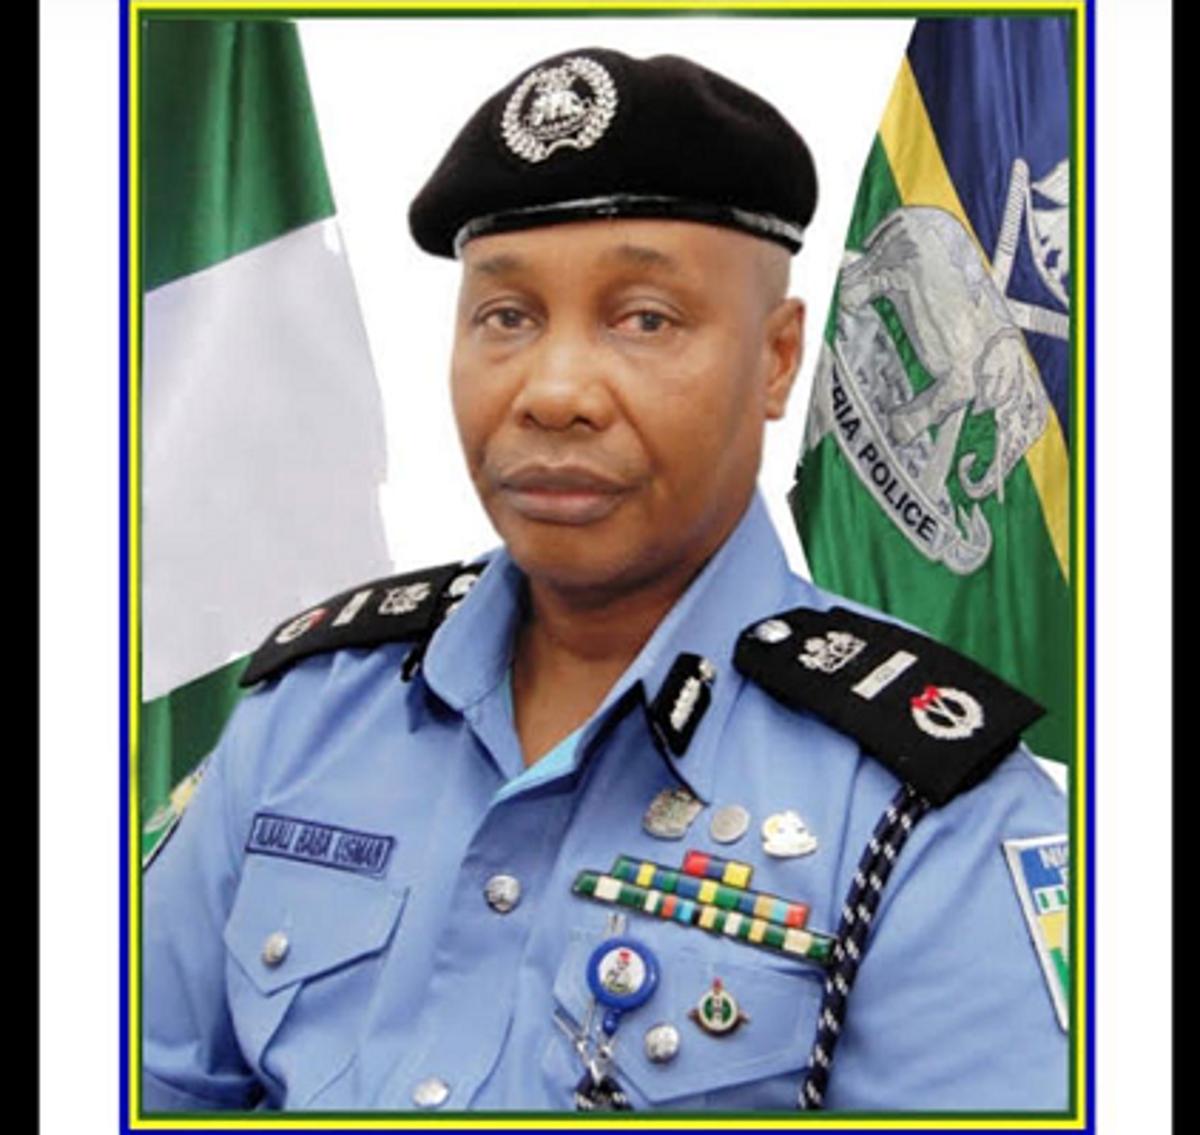 Profile of Nigeria's new Police chief, Usman Alkali Baba Buhari